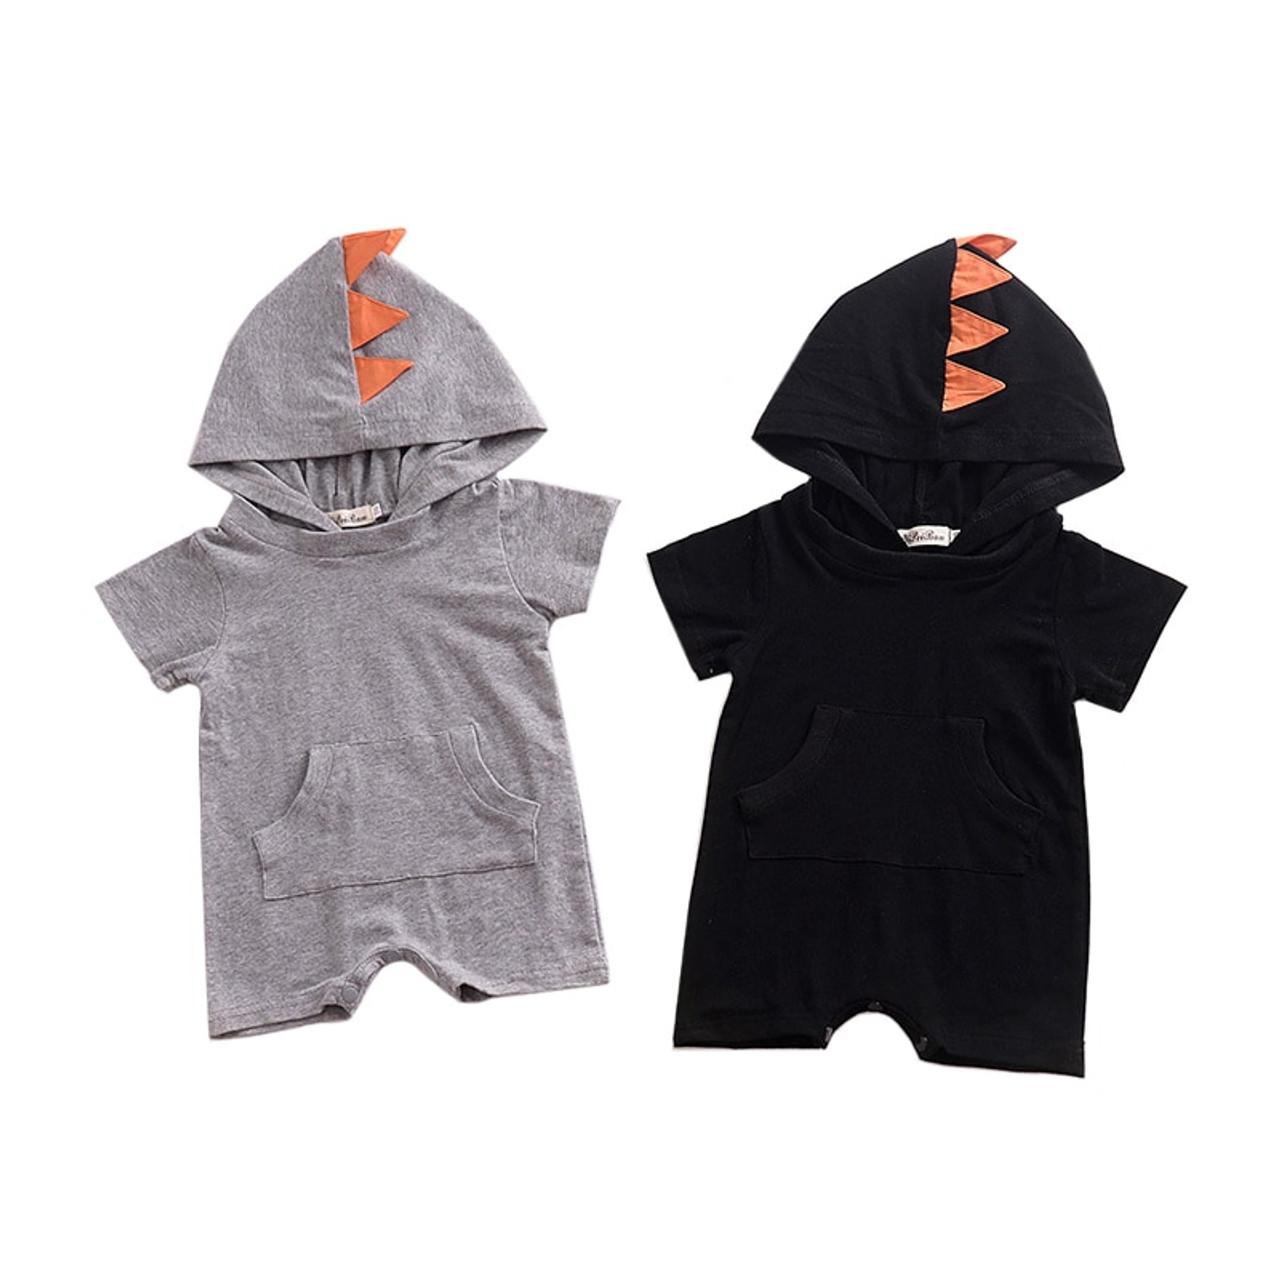 Unisex Child Cartoon Design Fox Hooded Jacket Outwear Coats Kids Clothing